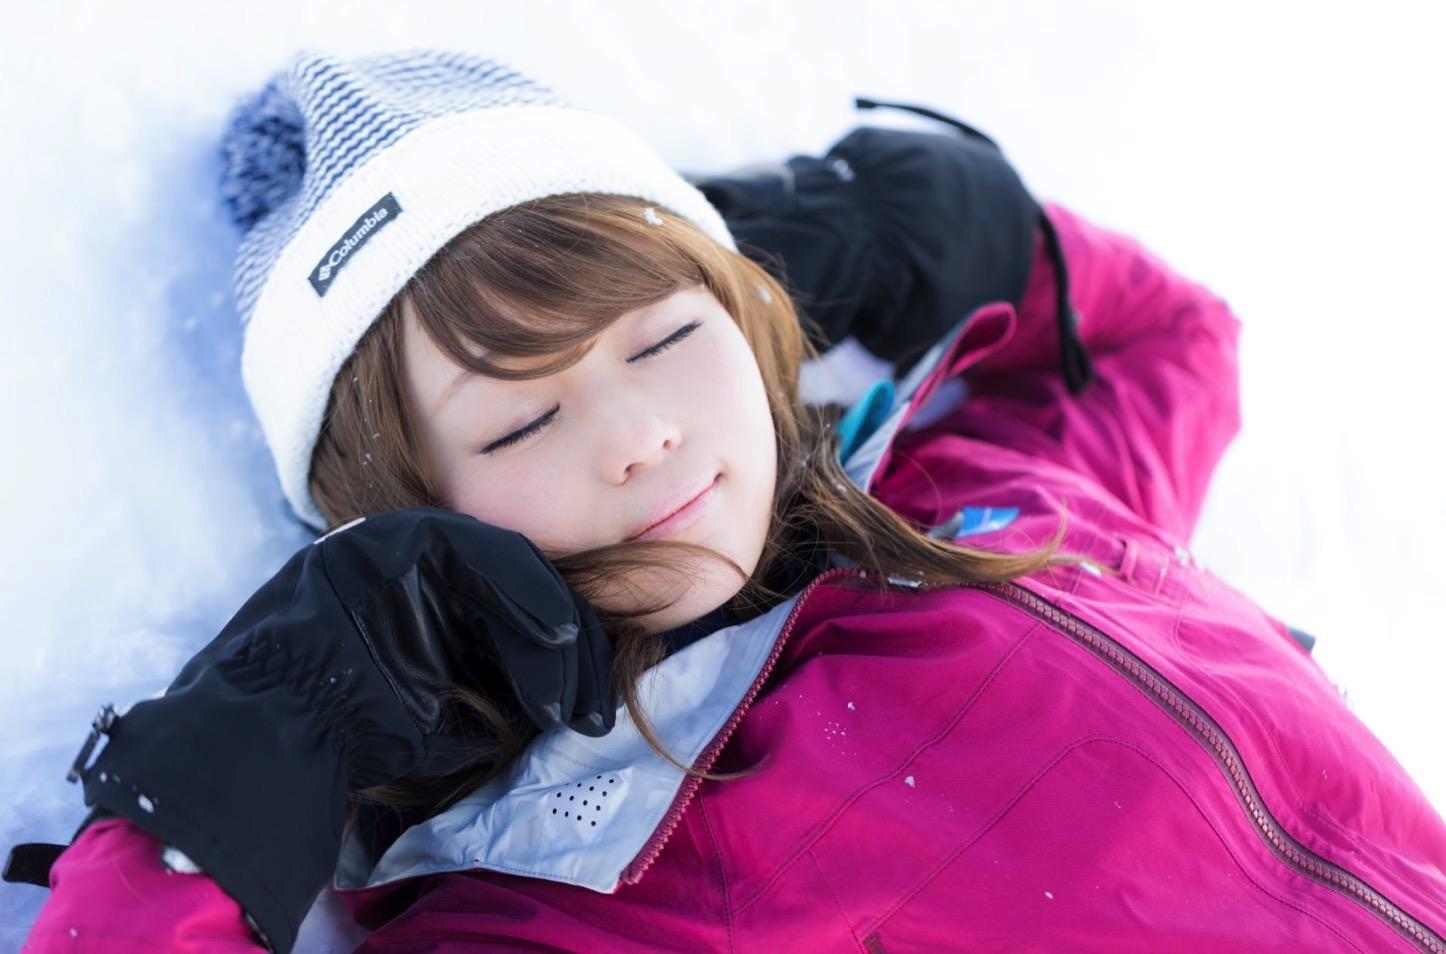 Akane-Saya-in-Hirayu-Onsen-Winter-21.jpg